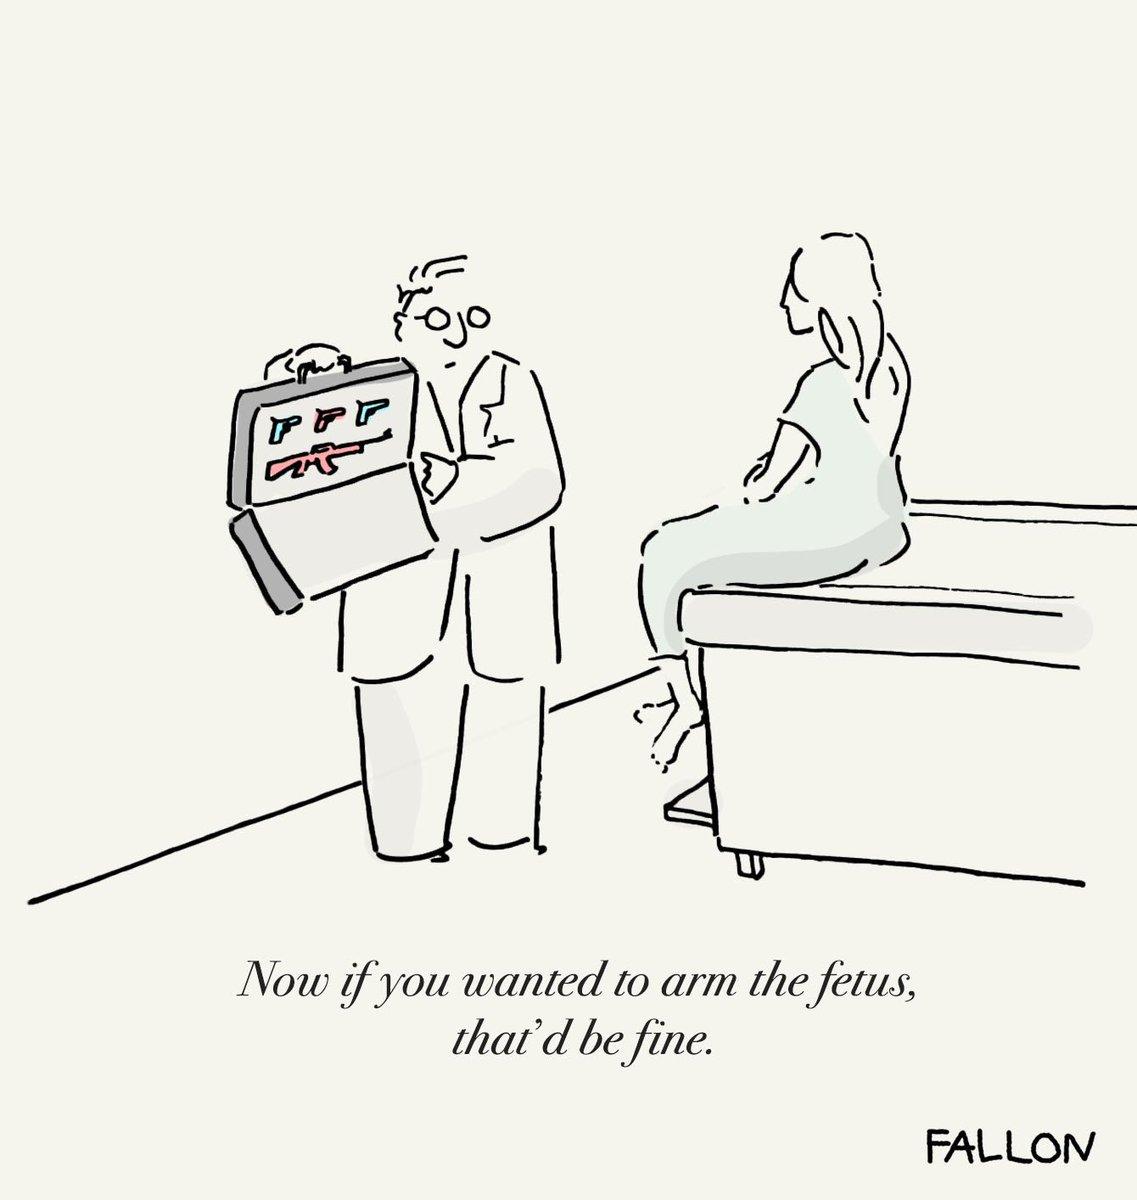 RT @__FALLON: the sanctity of life. #AlabamaAbortionBan #GOP https://t.co/0ApsbZ1yYw